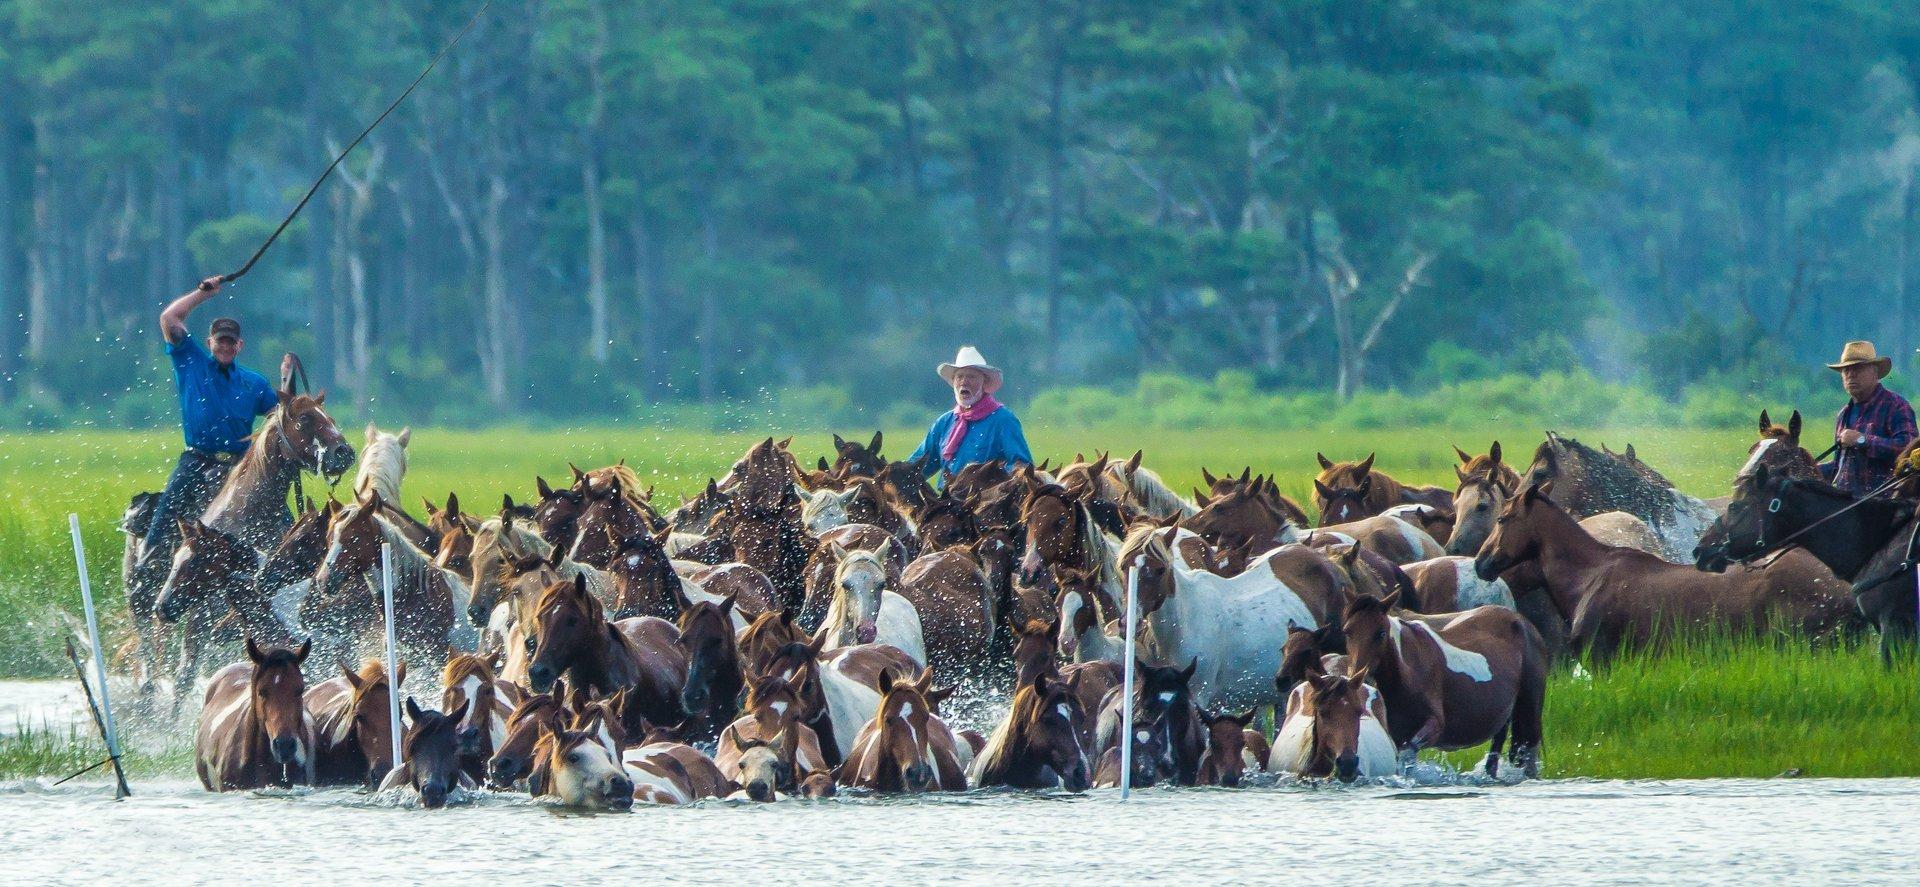 Chincoteague Pony Swim in Virginia - Best Season 2020